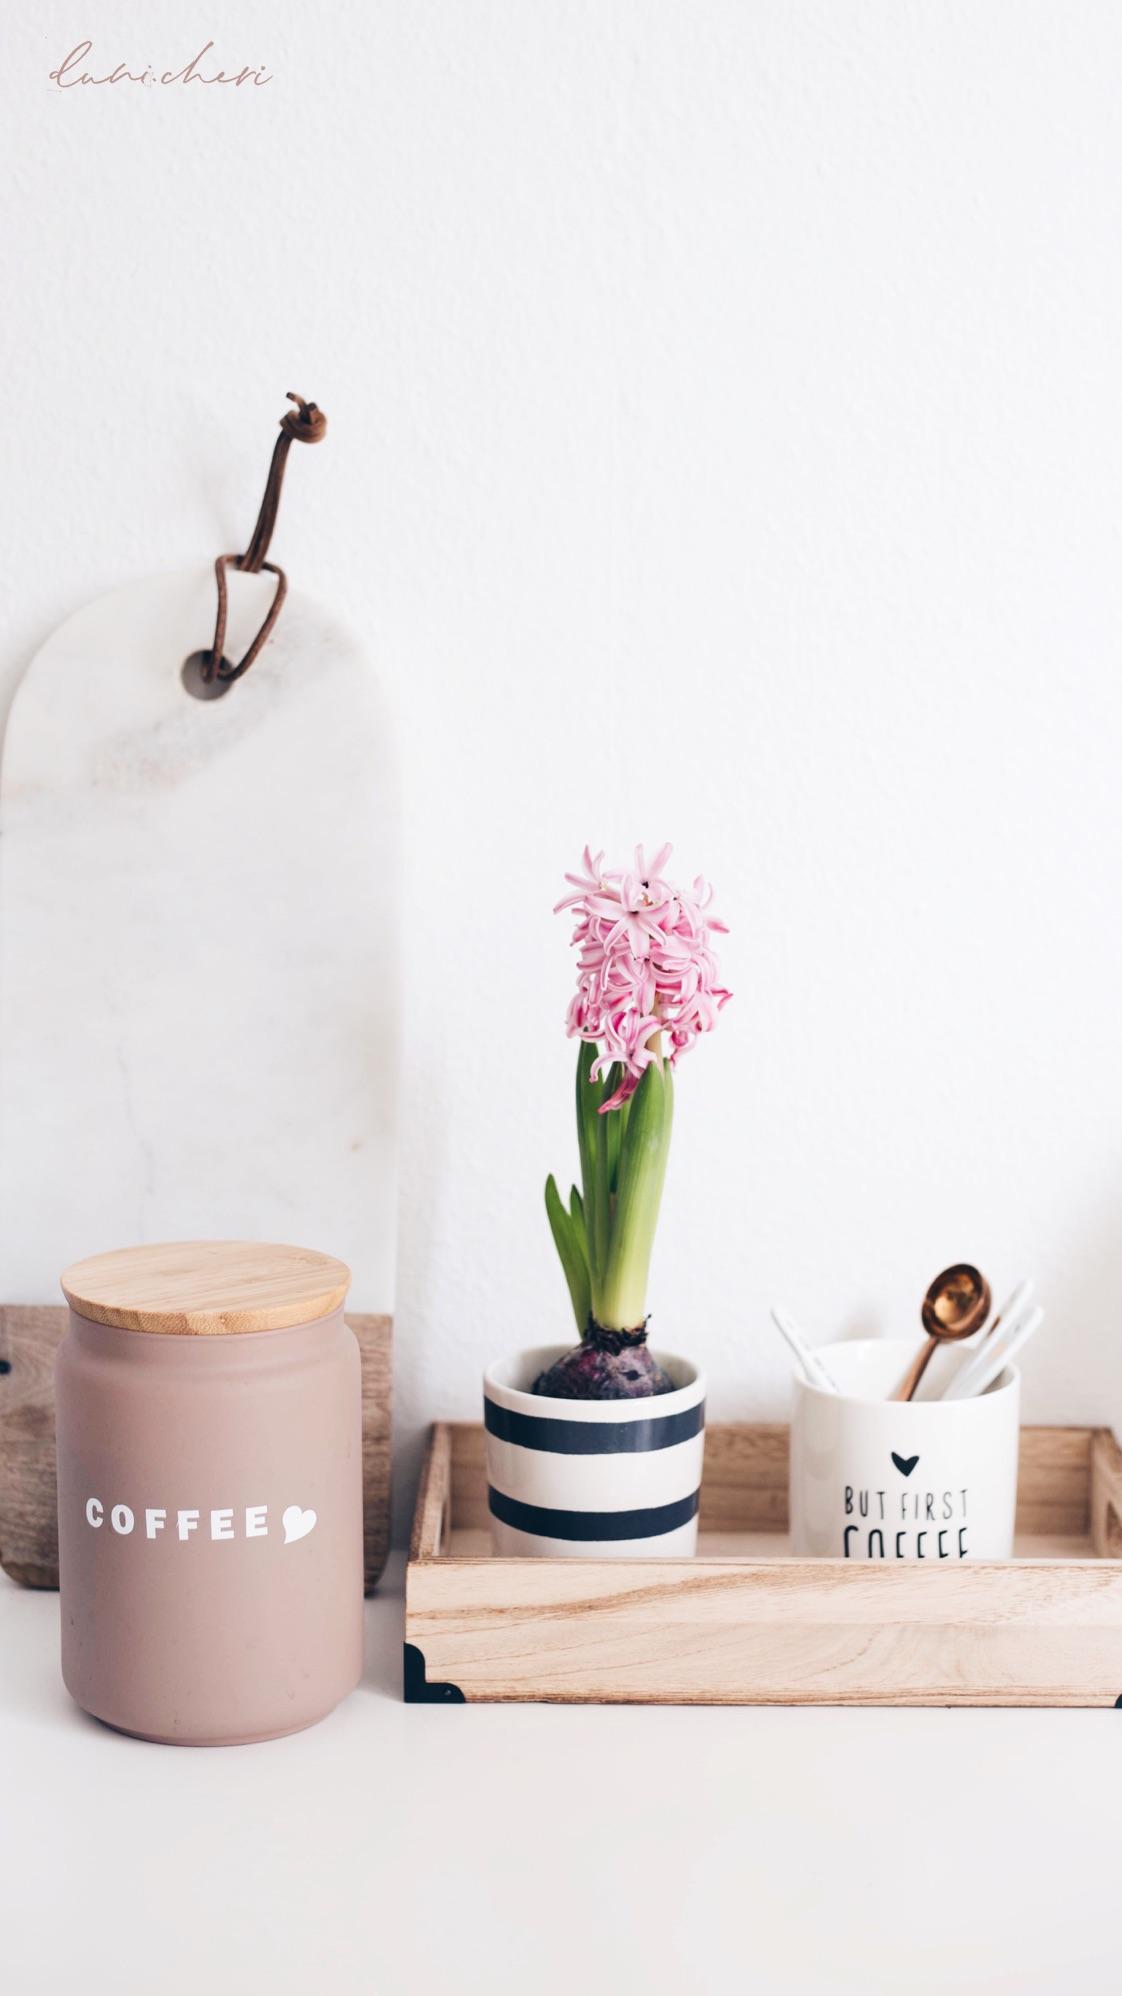 free mobil wallpaper coffee